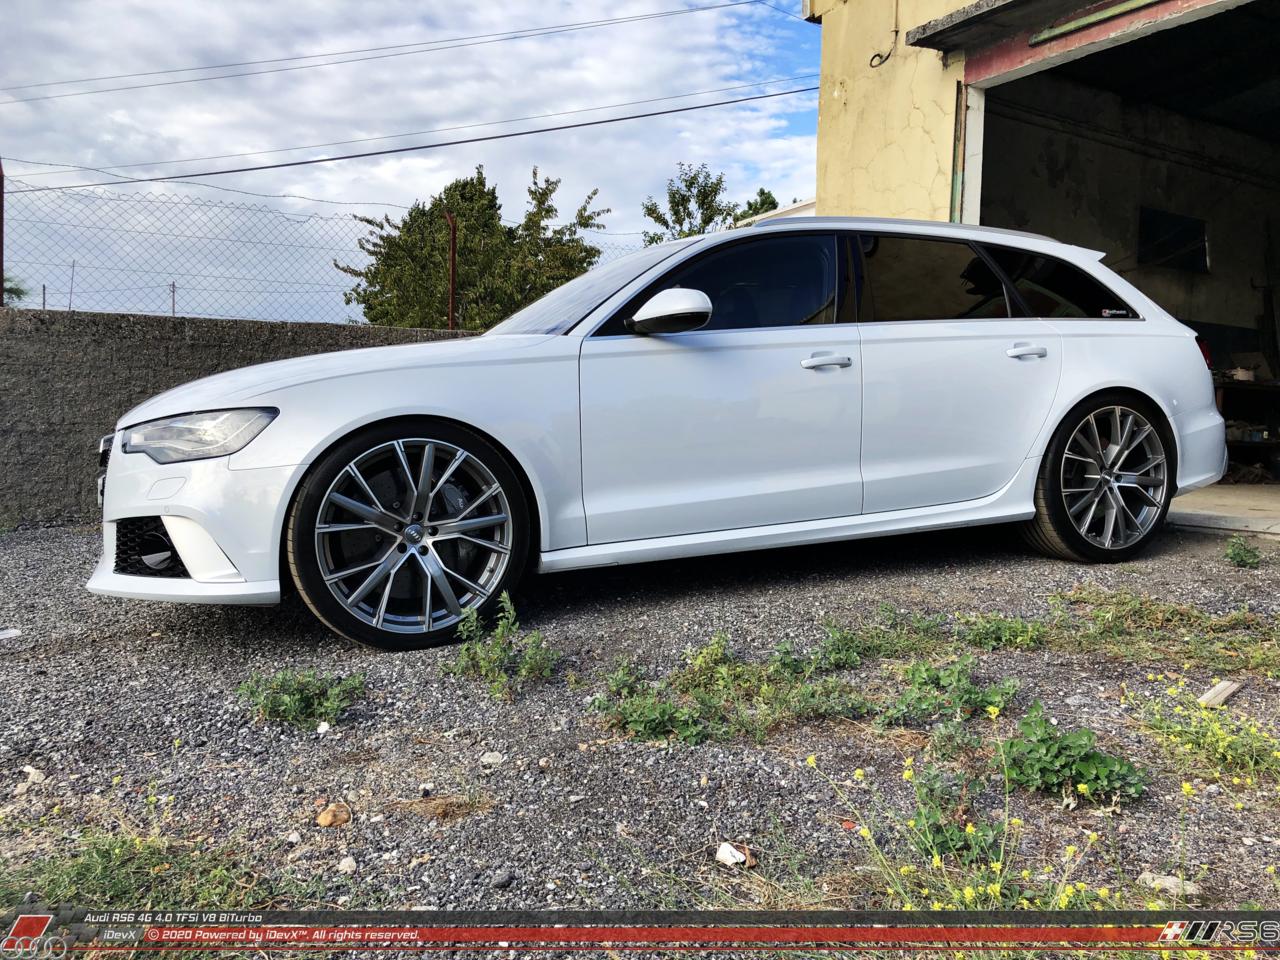 05_08.2019_Audi-RS6_iDevX_061.png